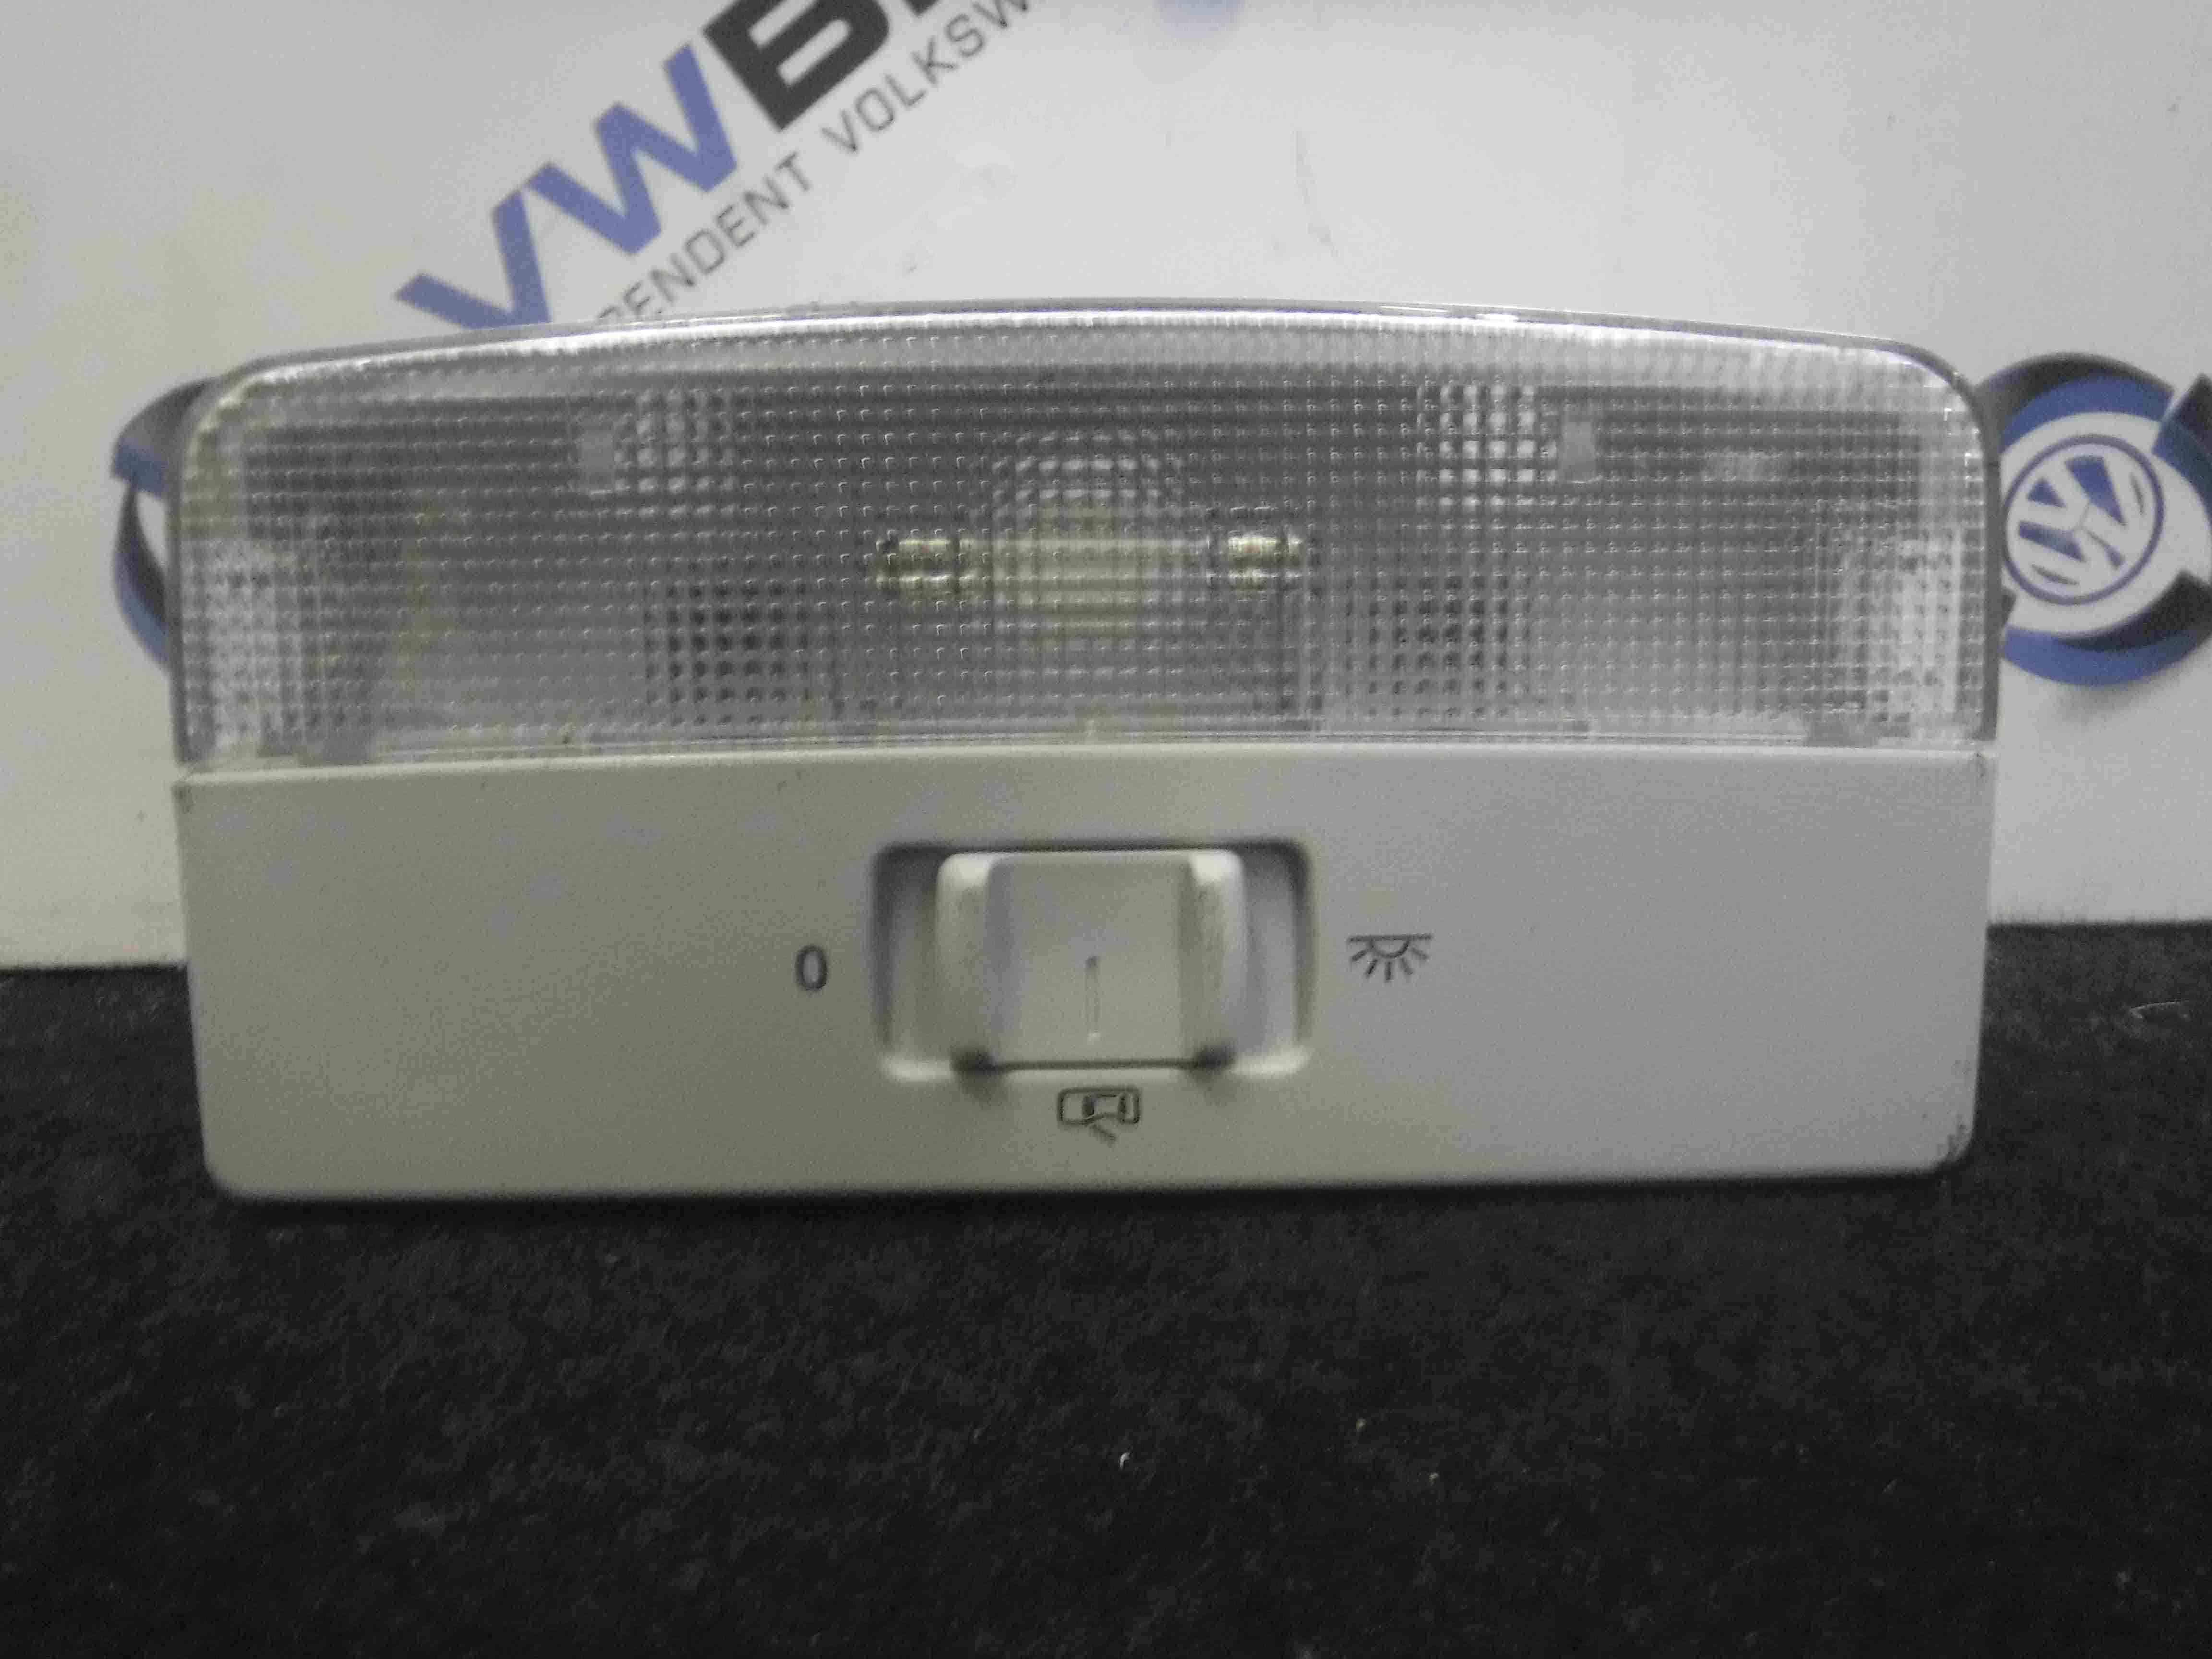 Volkswagen Polo 2003-2006 9N 9N3 Interior Roof Light 6Q0947105F